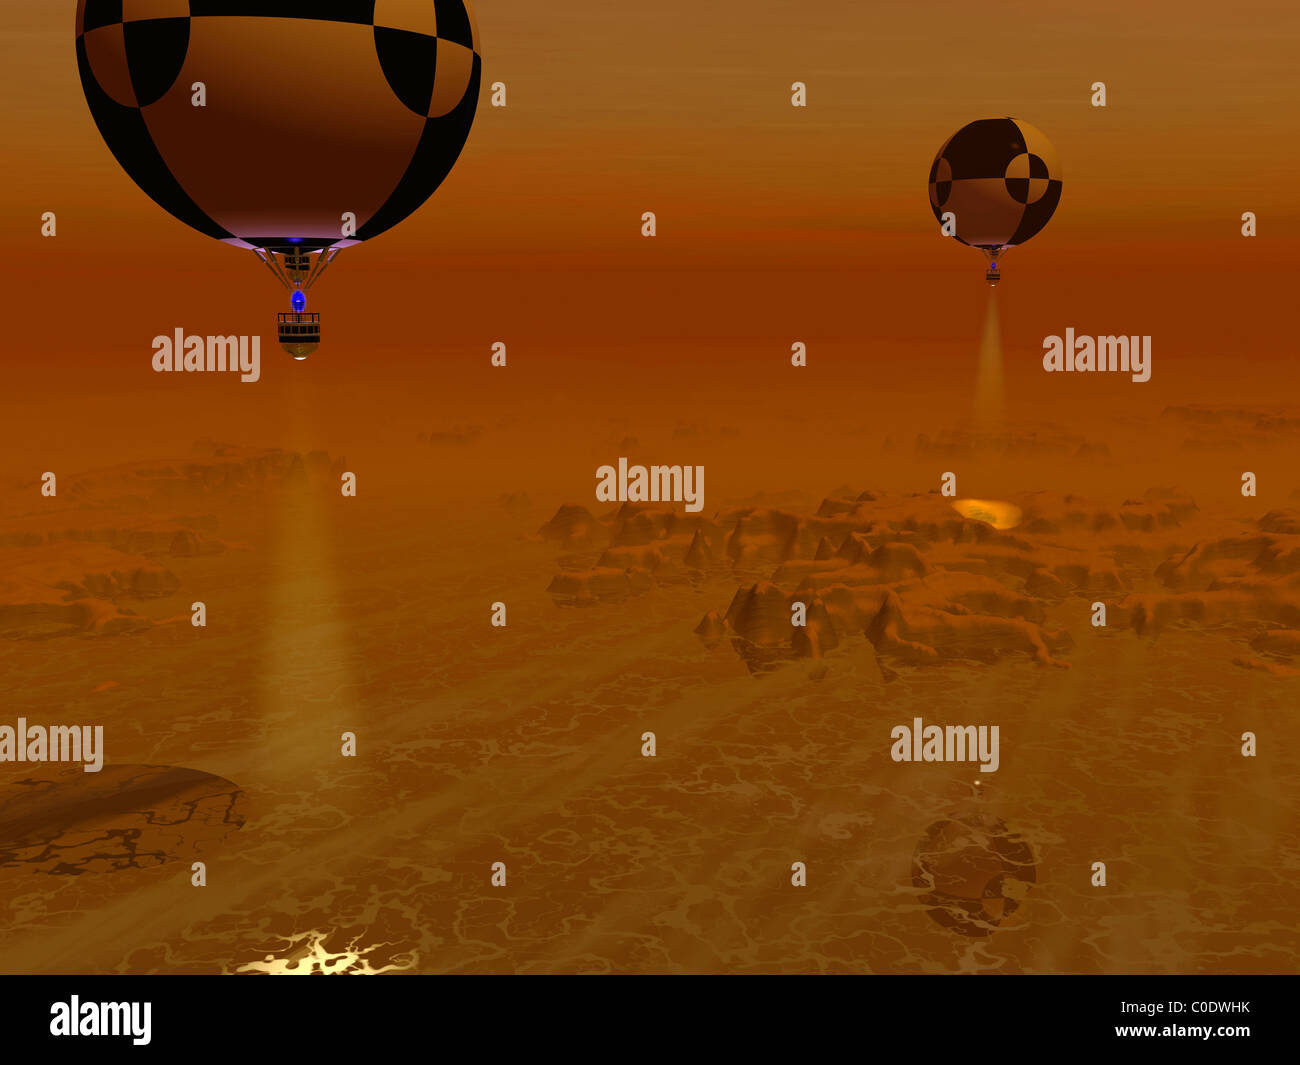 A pair of balloon-borne probes leisurely survey the surface of Titan. - Stock Image